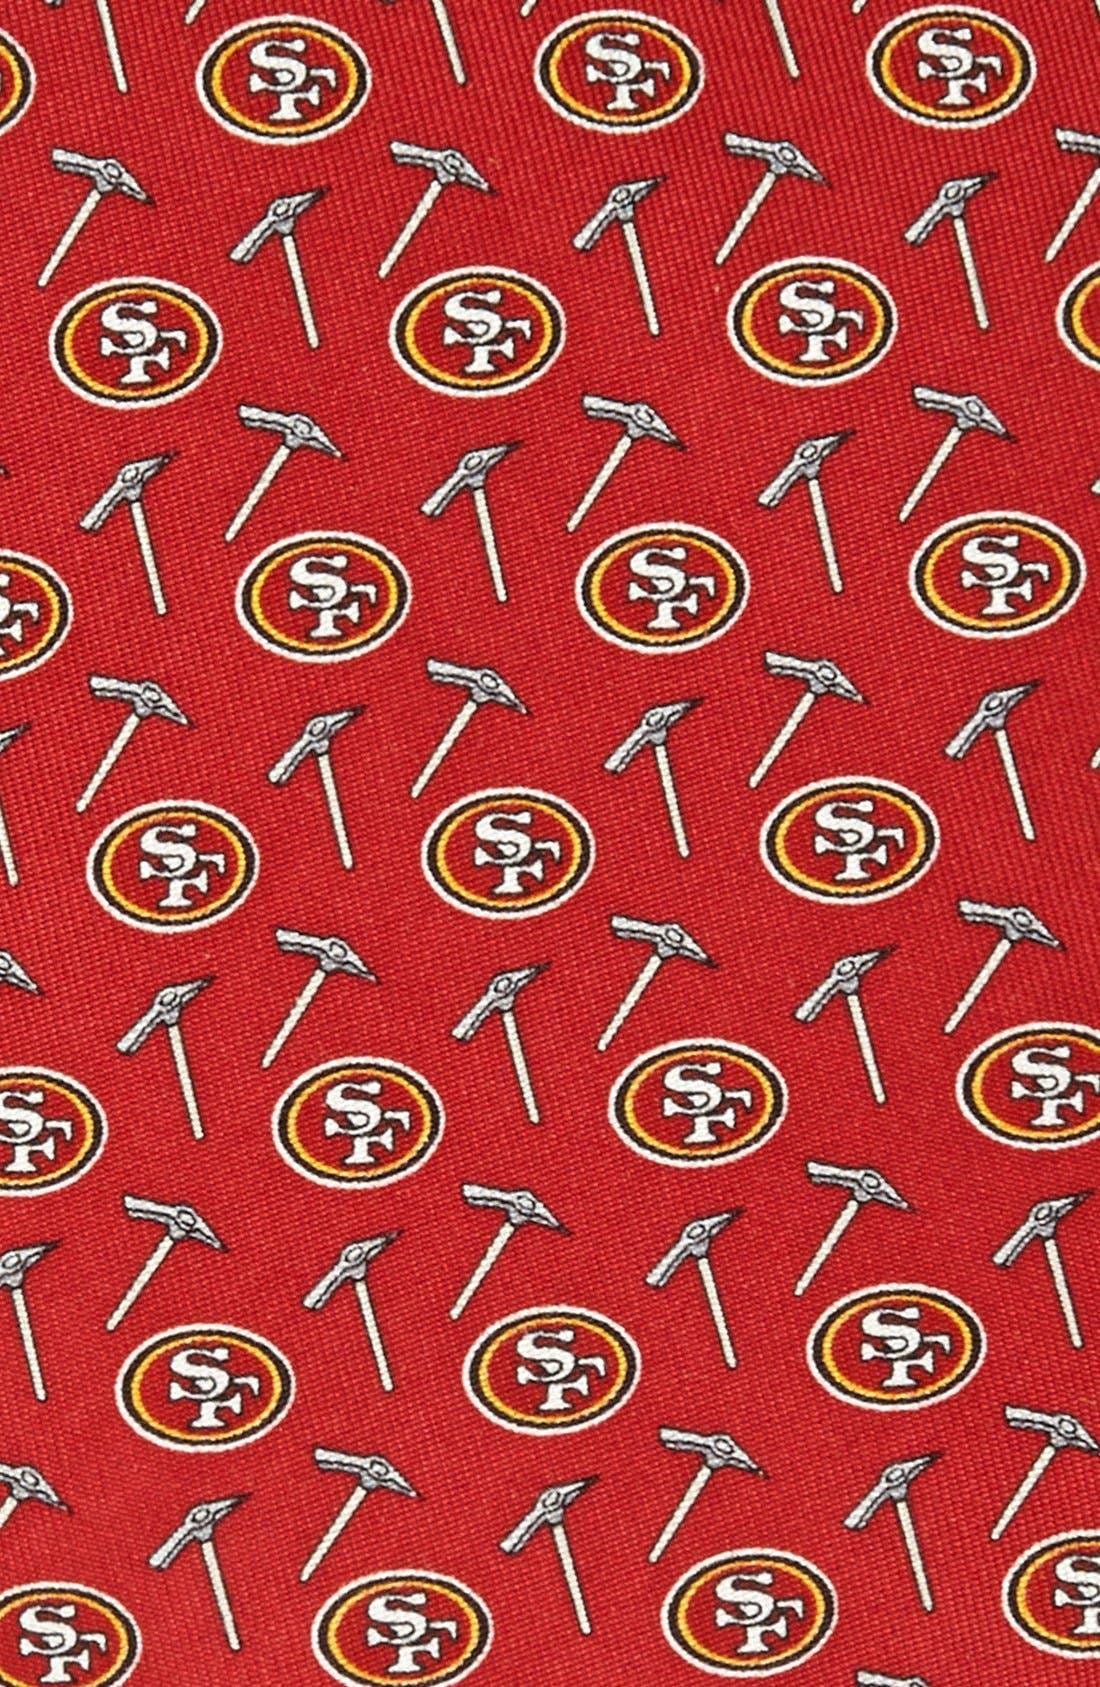 VINEYARD VINES, San Francisco 49ers Print Tie, Alternate thumbnail 2, color, RED